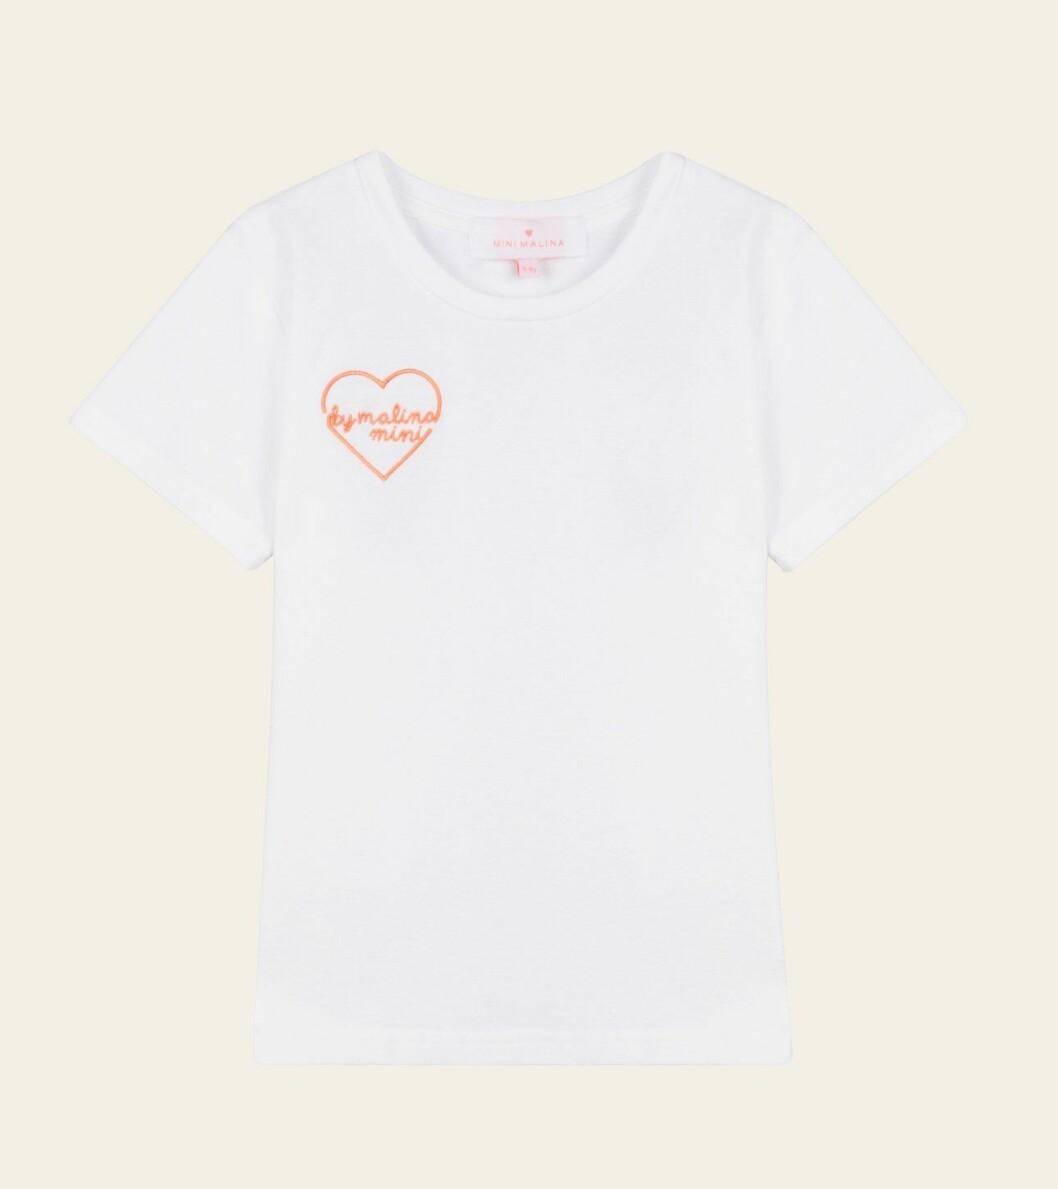 Mini Malina collection 2020: Vit t-shirt för barn